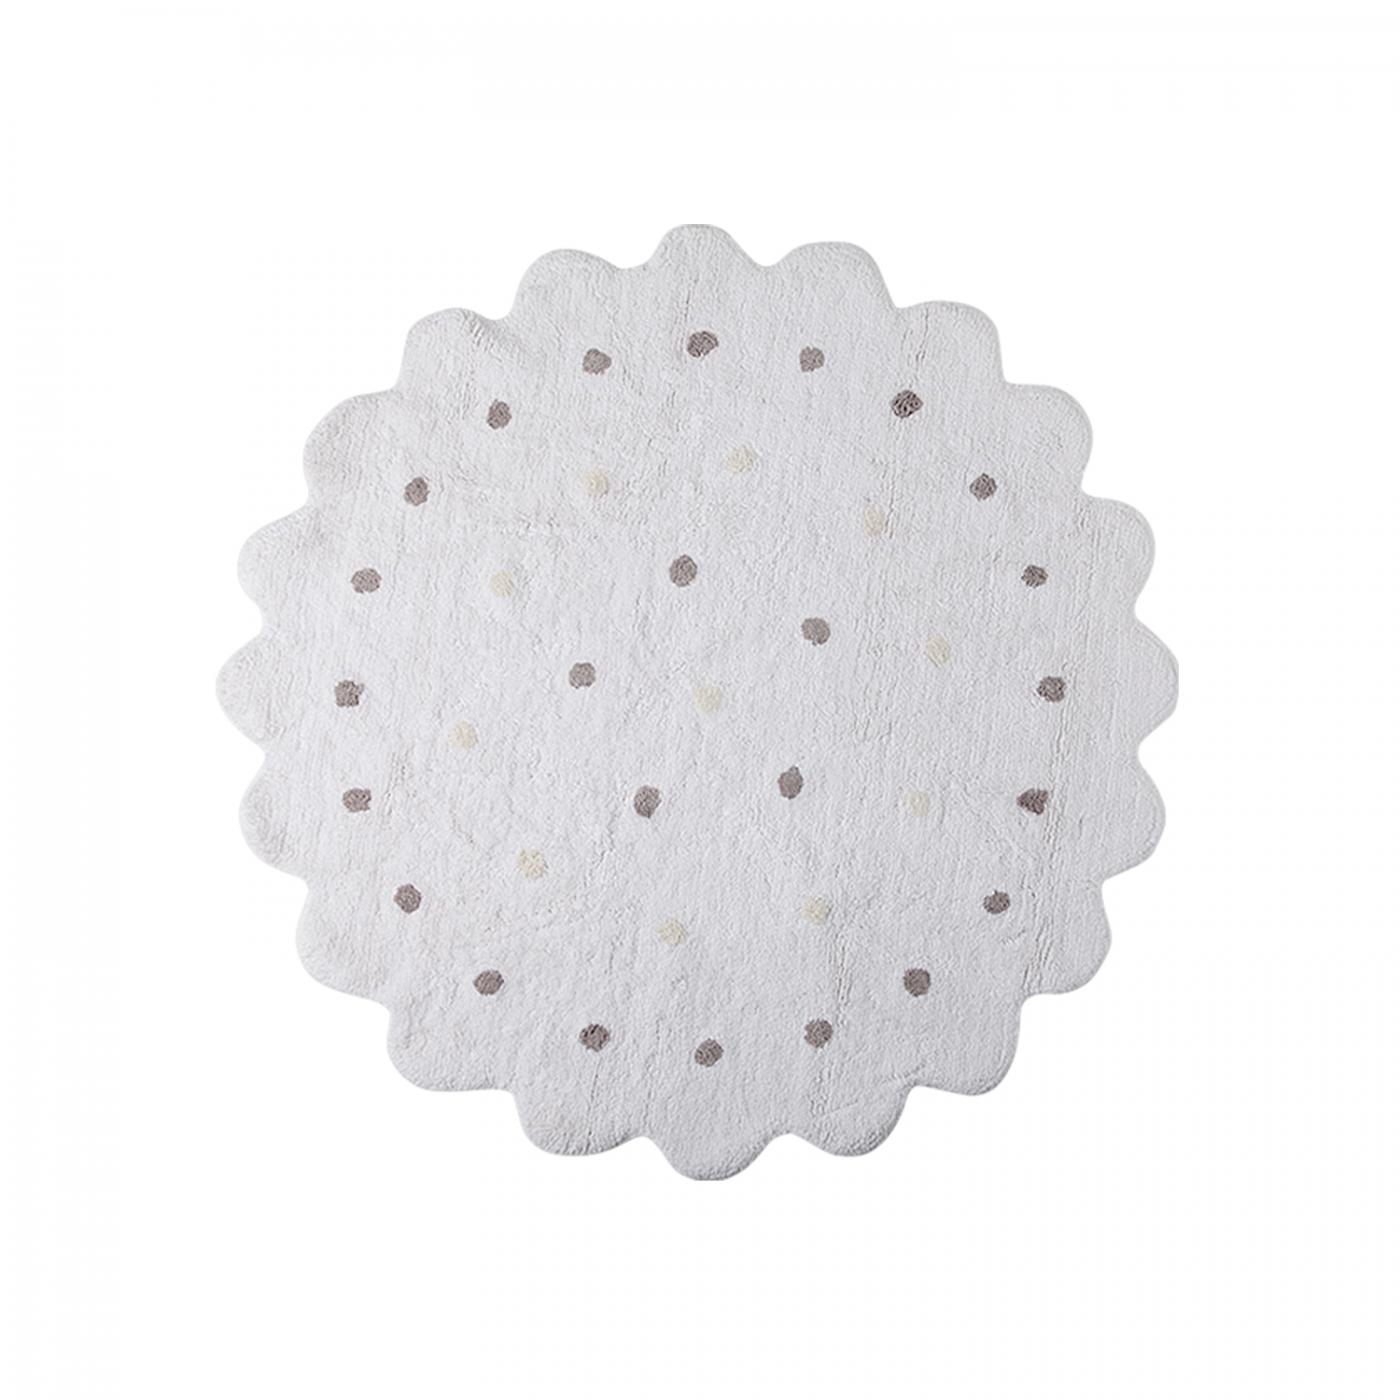 tapis petit biscuit rond blanc 140 yadayada. Black Bedroom Furniture Sets. Home Design Ideas